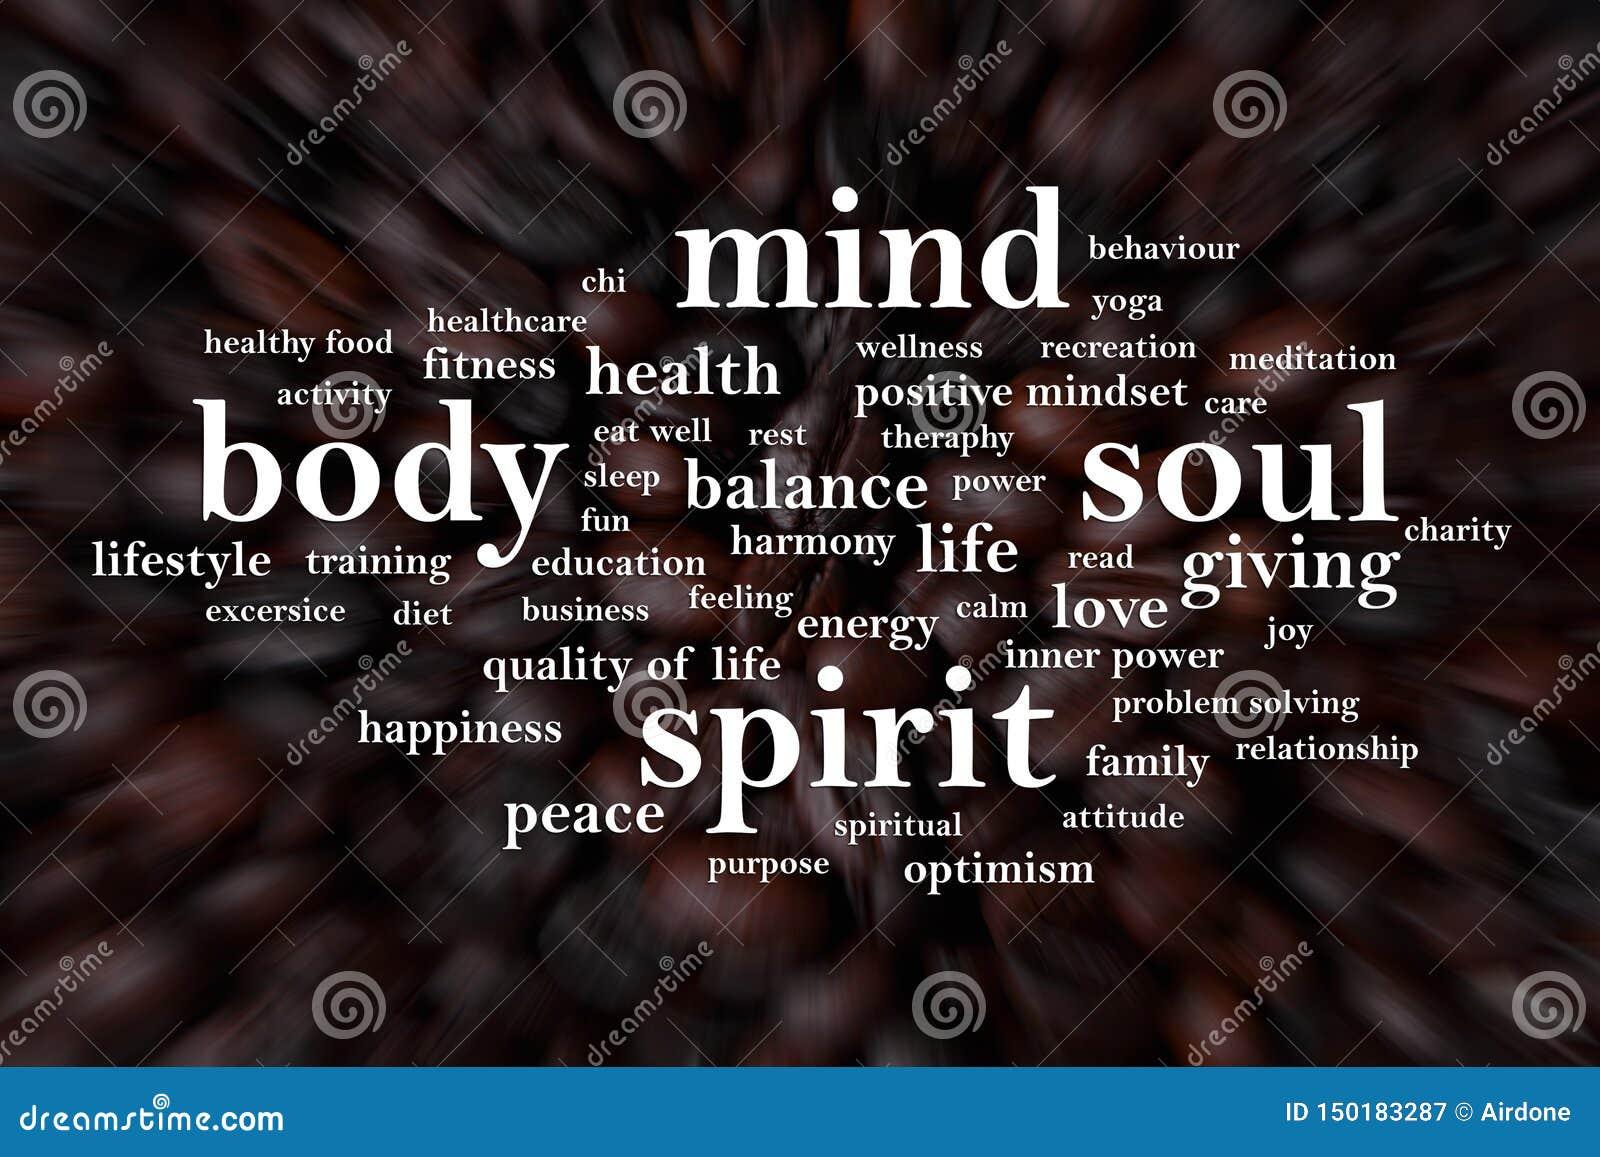 Body Mind Soul Spirit, Motivational Words Quotes Concept